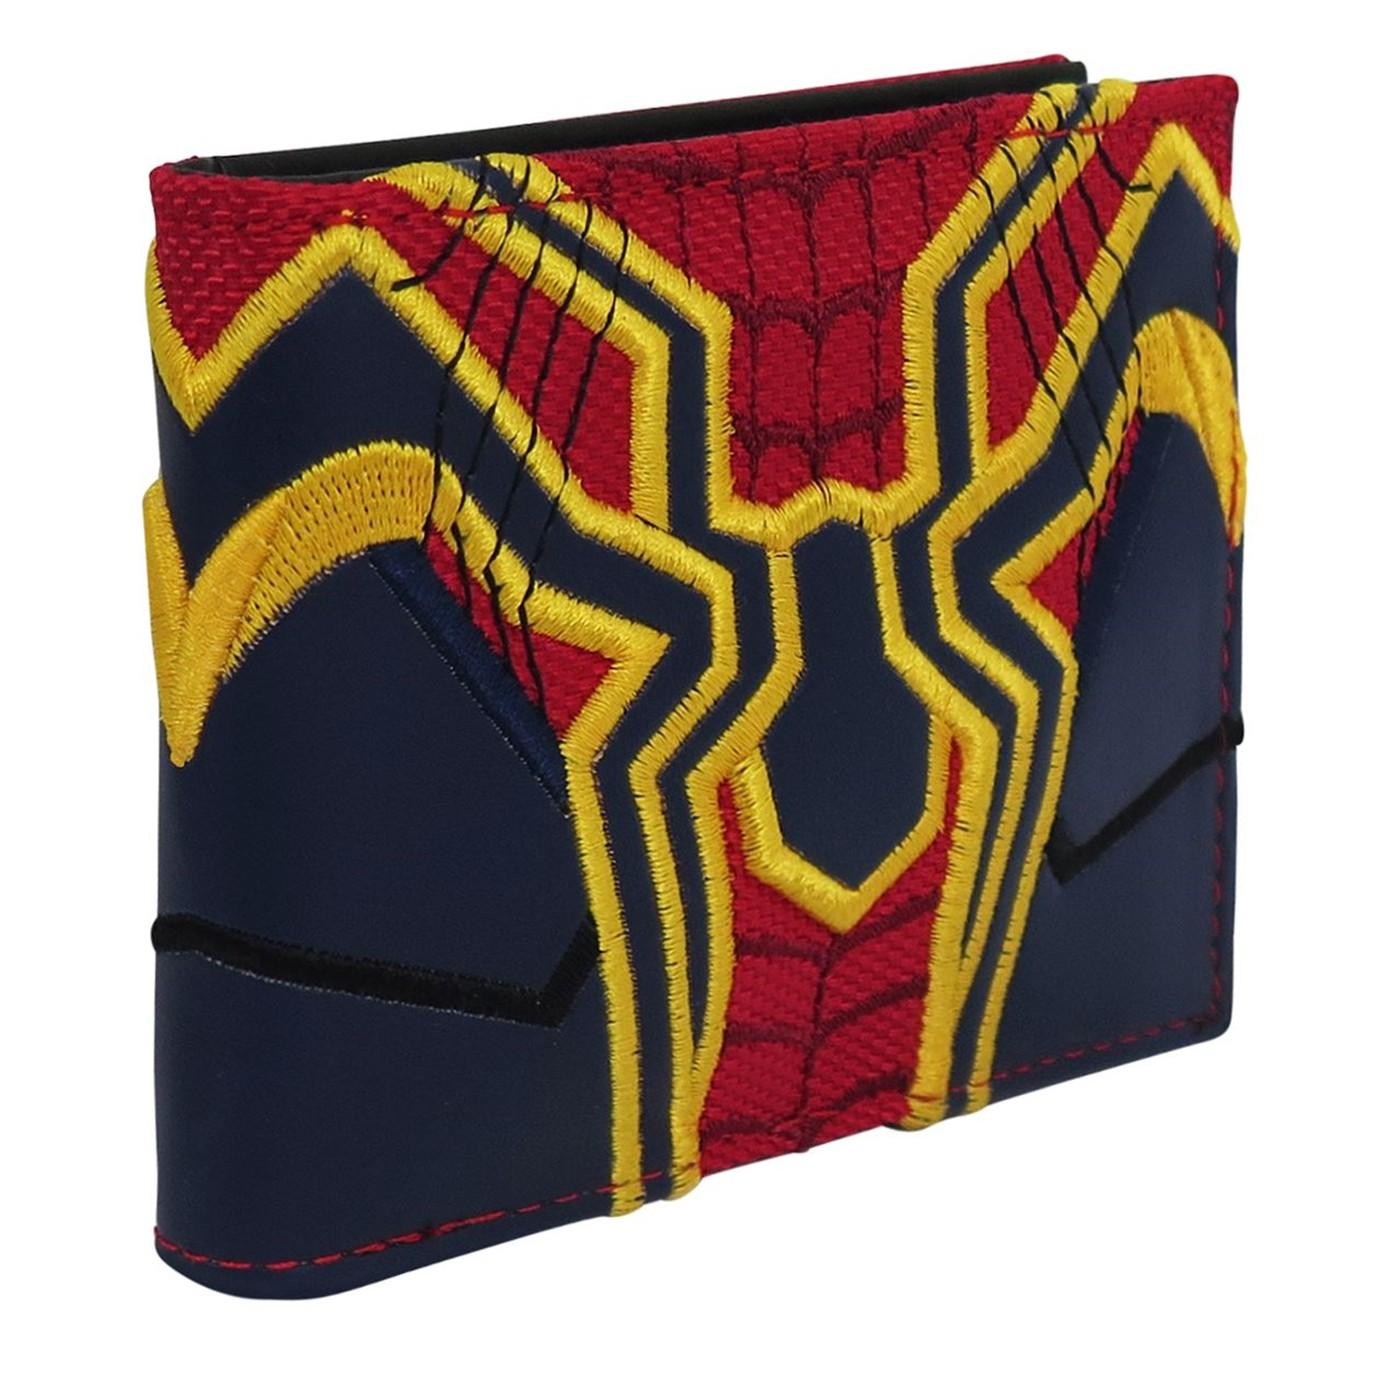 Avengers Infinity War Iron Spider Suit-Up Wallet